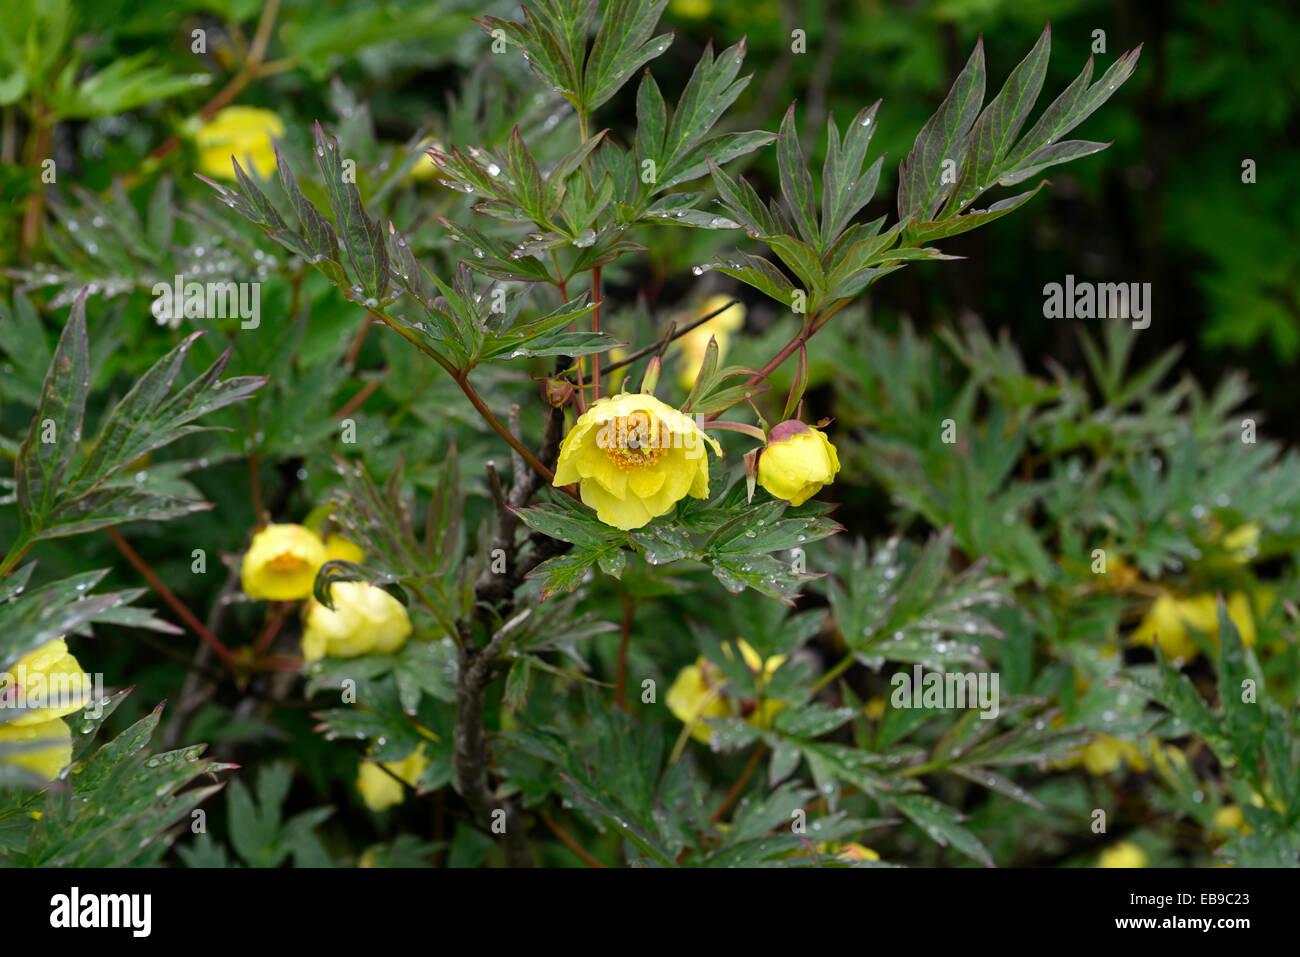 Paeonia Potaninii Yellow Flowers Tree Peony Peonies Scented Summer